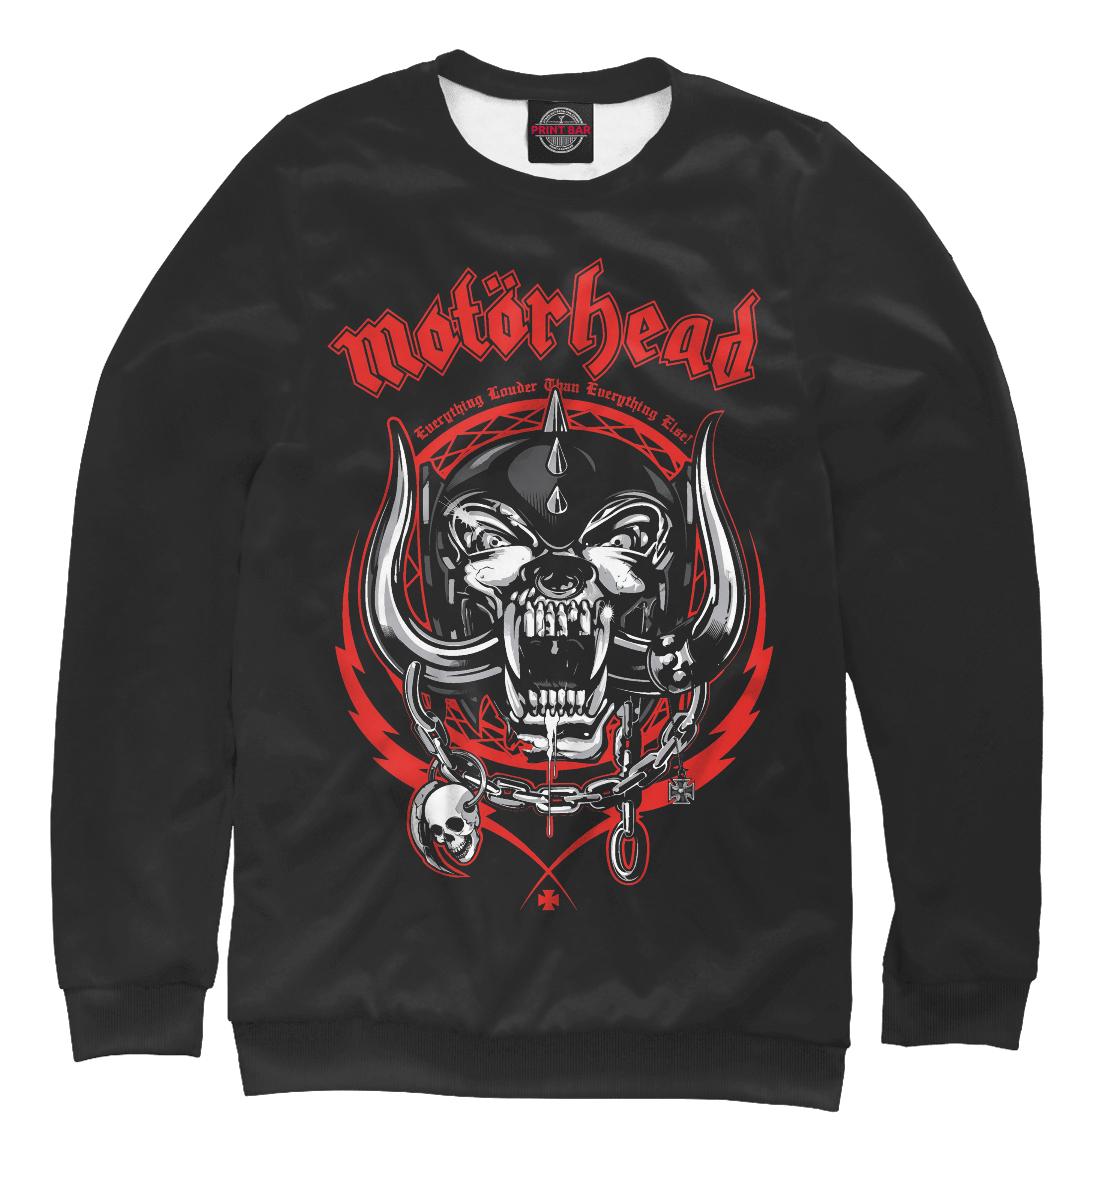 Купить Motorhead, Printbar, Свитшоты, MOT-557763-swi-1